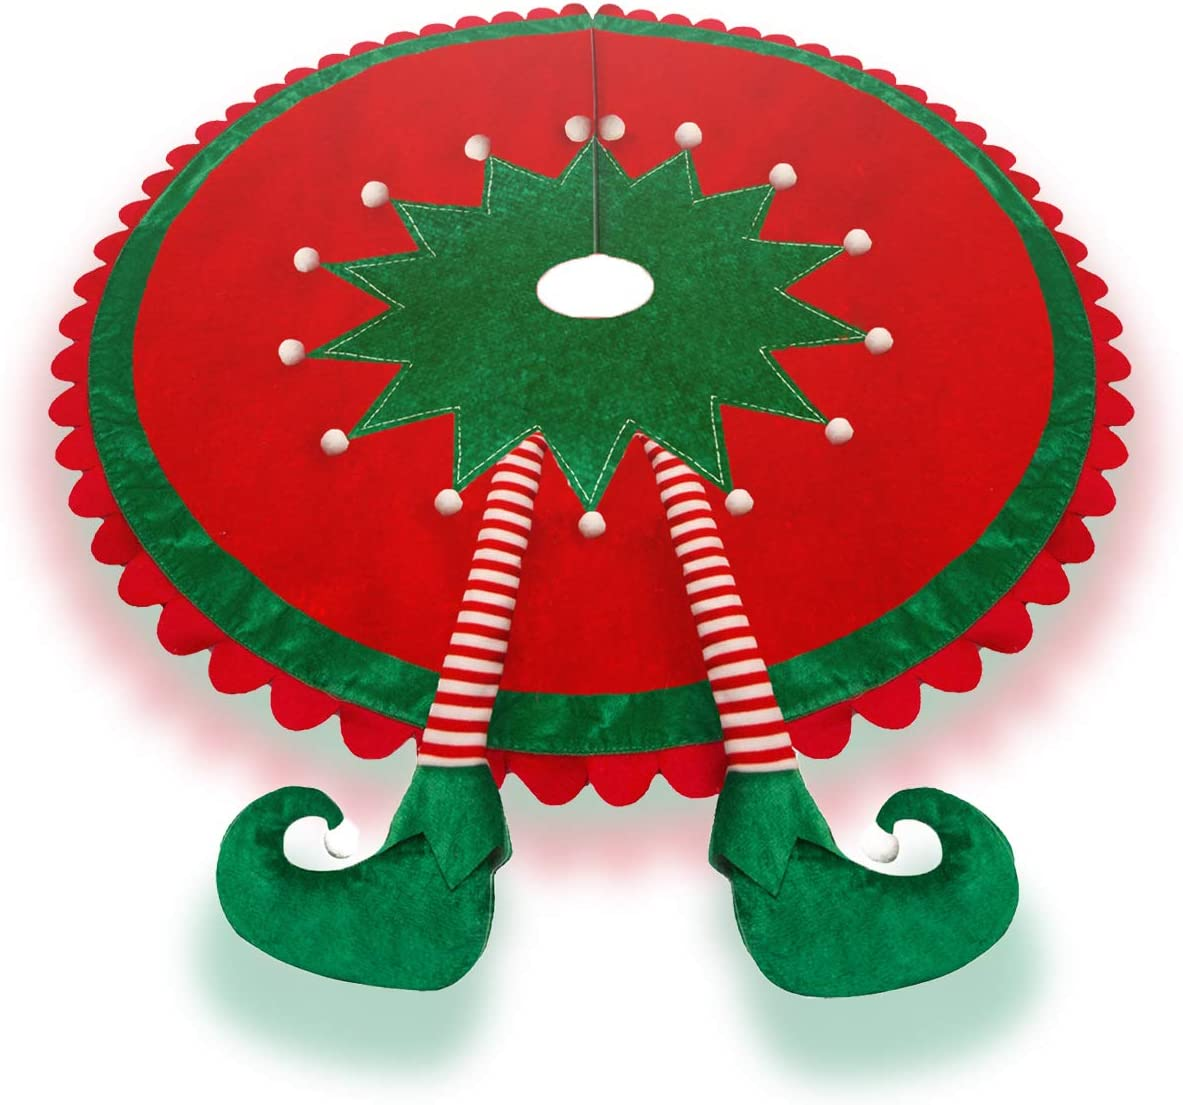 TangJing Elf Christmas Tree Skirt Legs.Ripple Save money with Tr Delightful shipfree